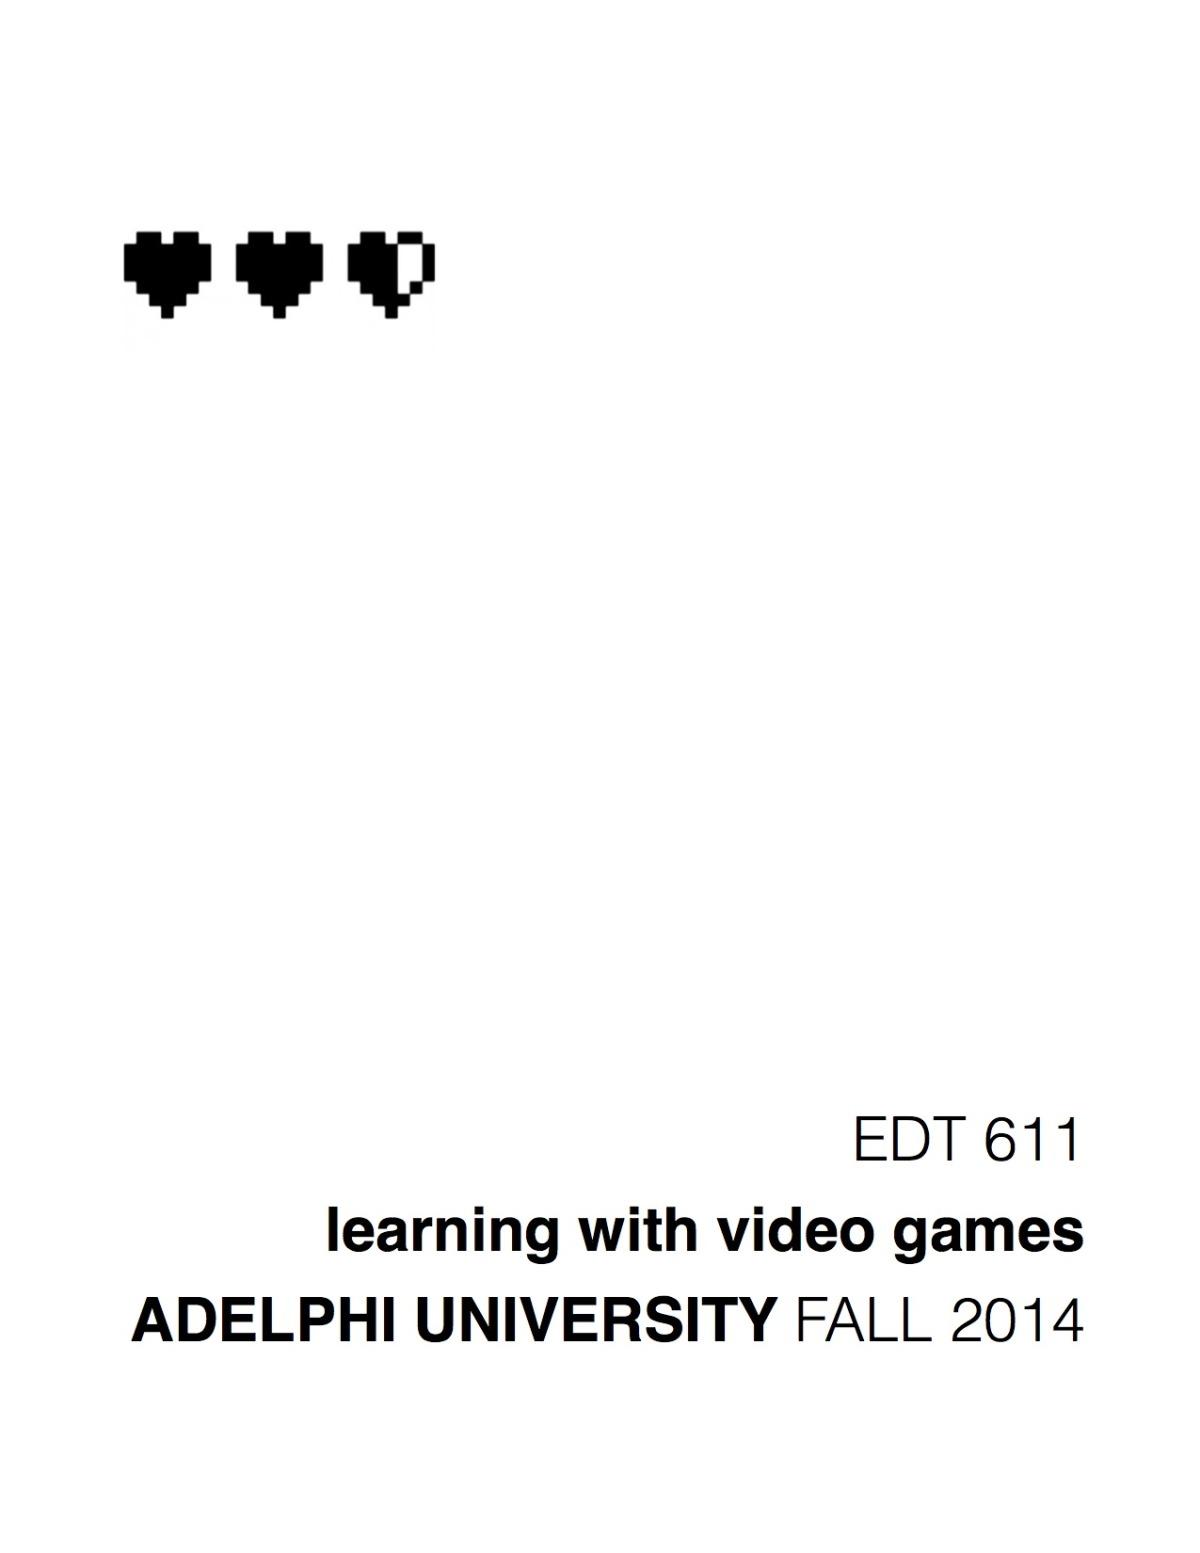 flyer 2 - hearts.jpg